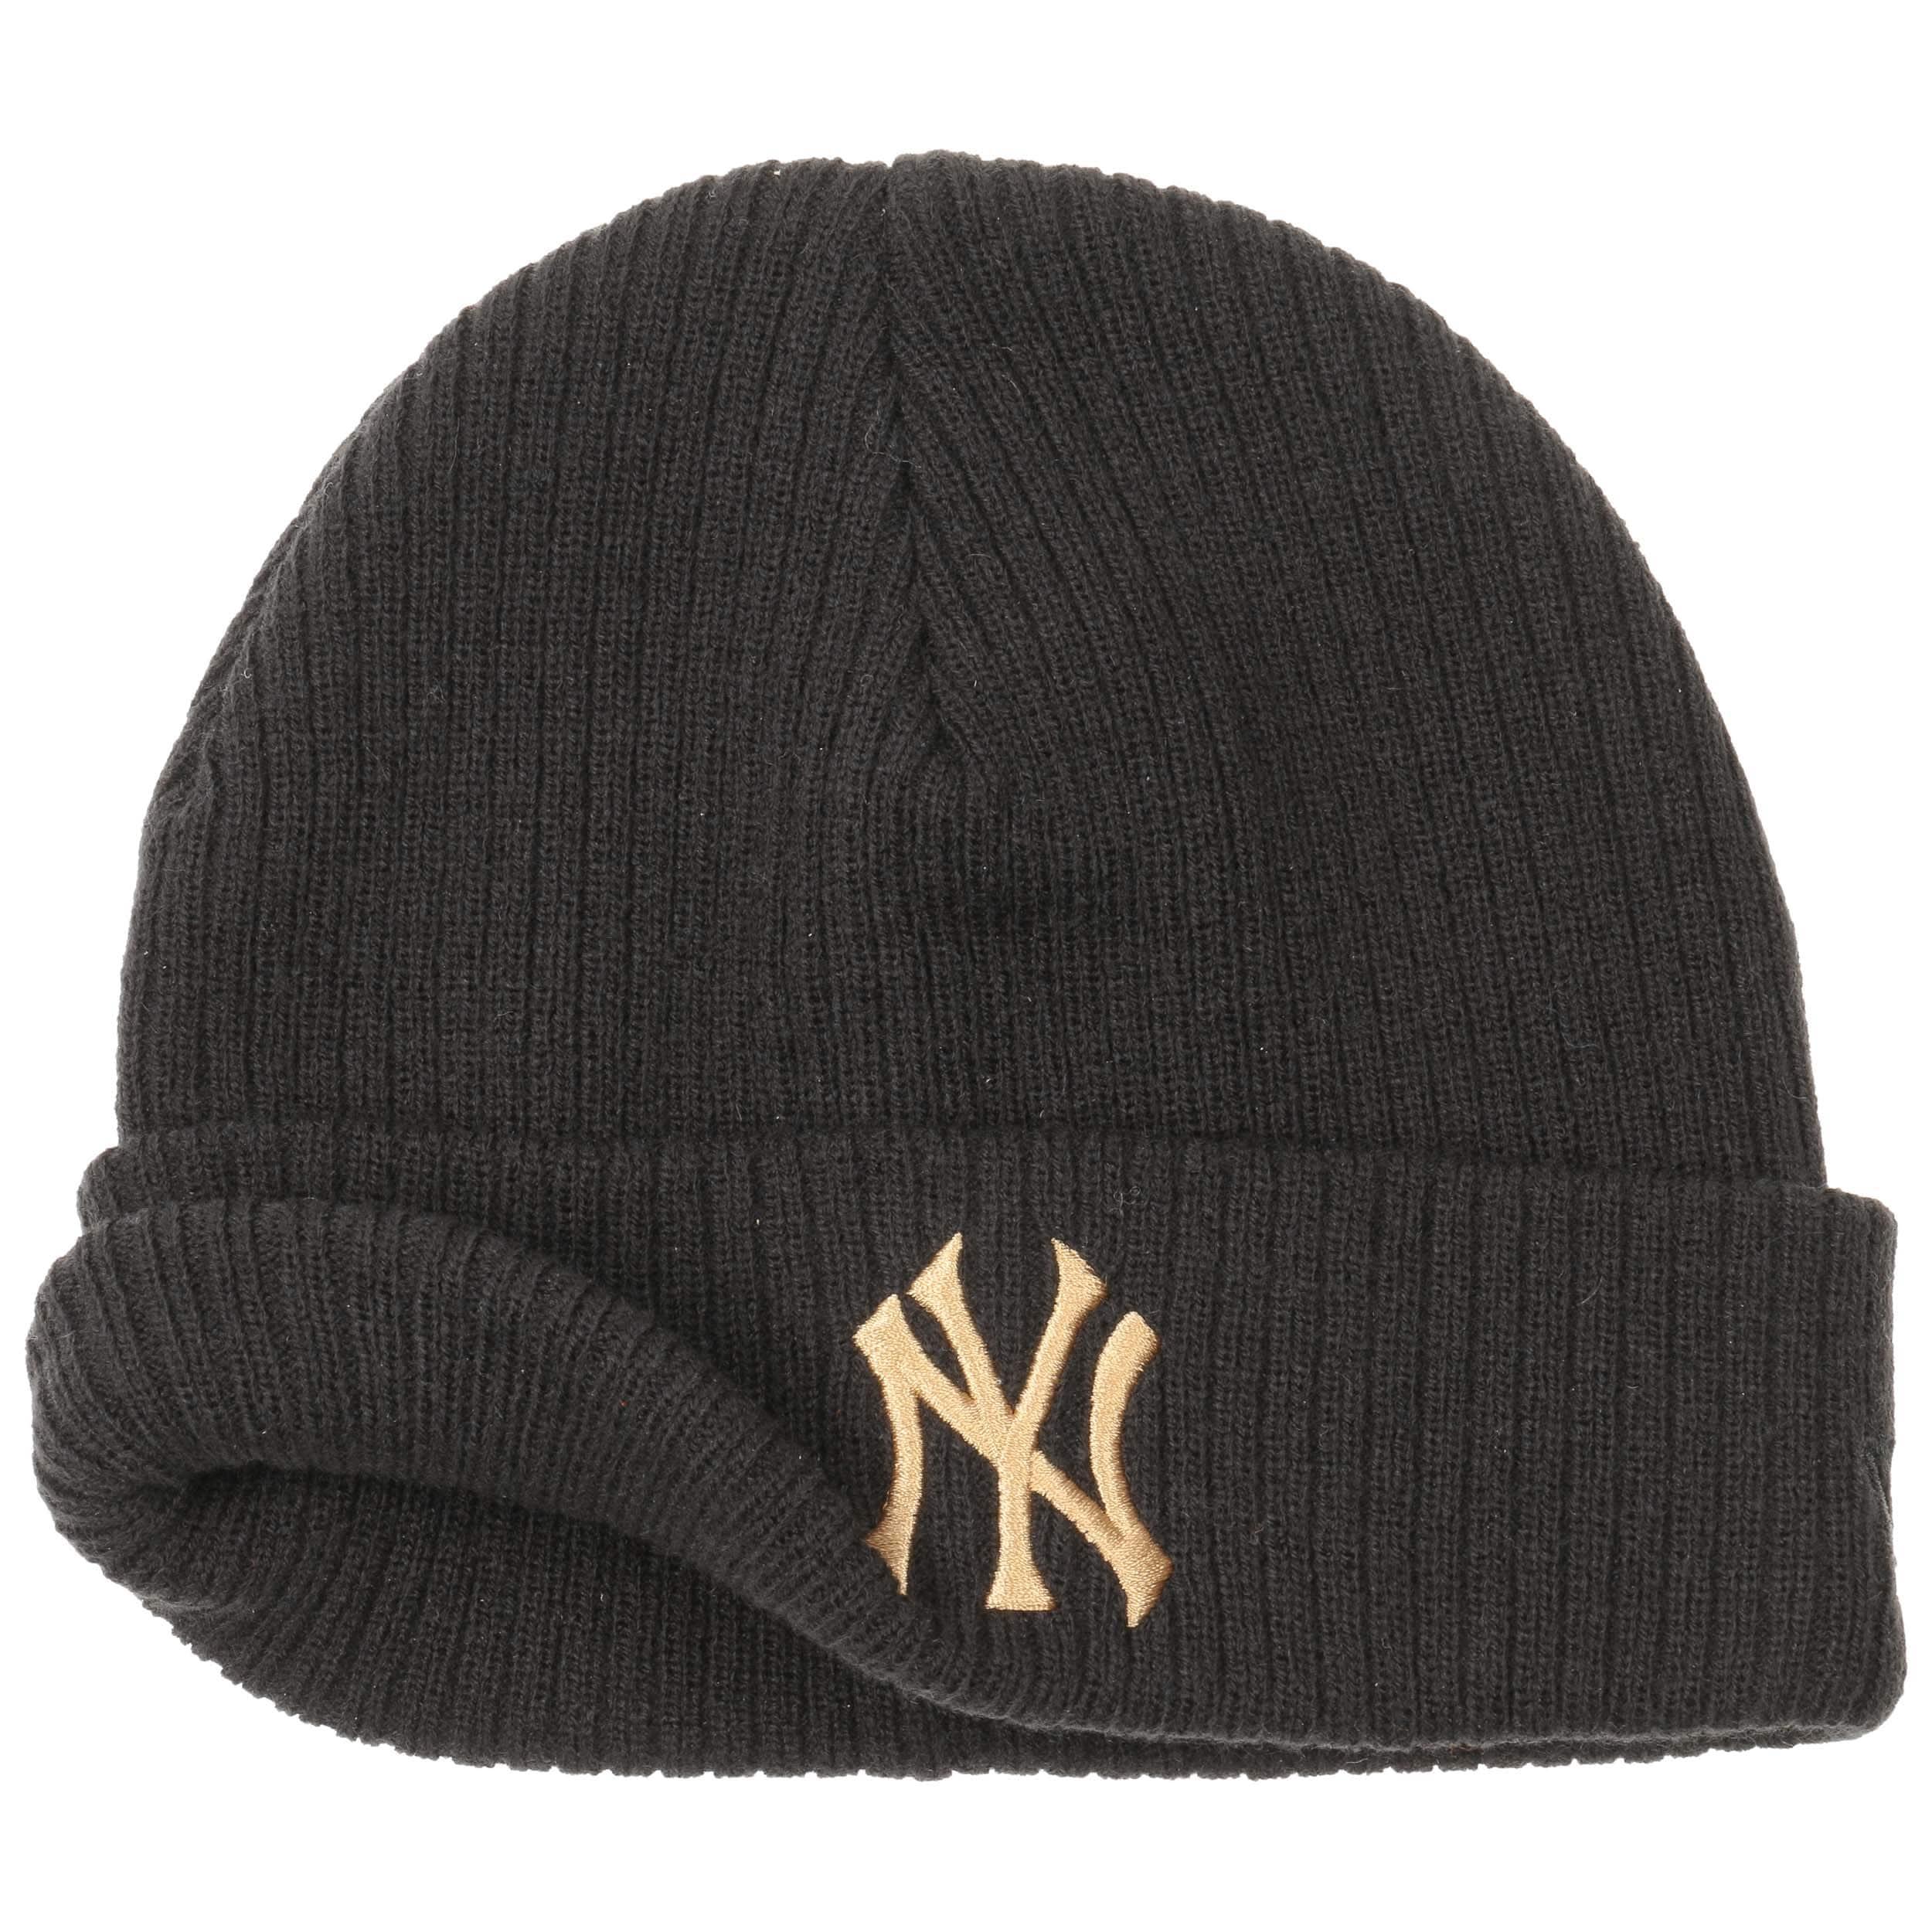 2f1de41aa8a57 Gorro Beanie Club Coop Yankees by New Era - Gorros - sombreroshop.es